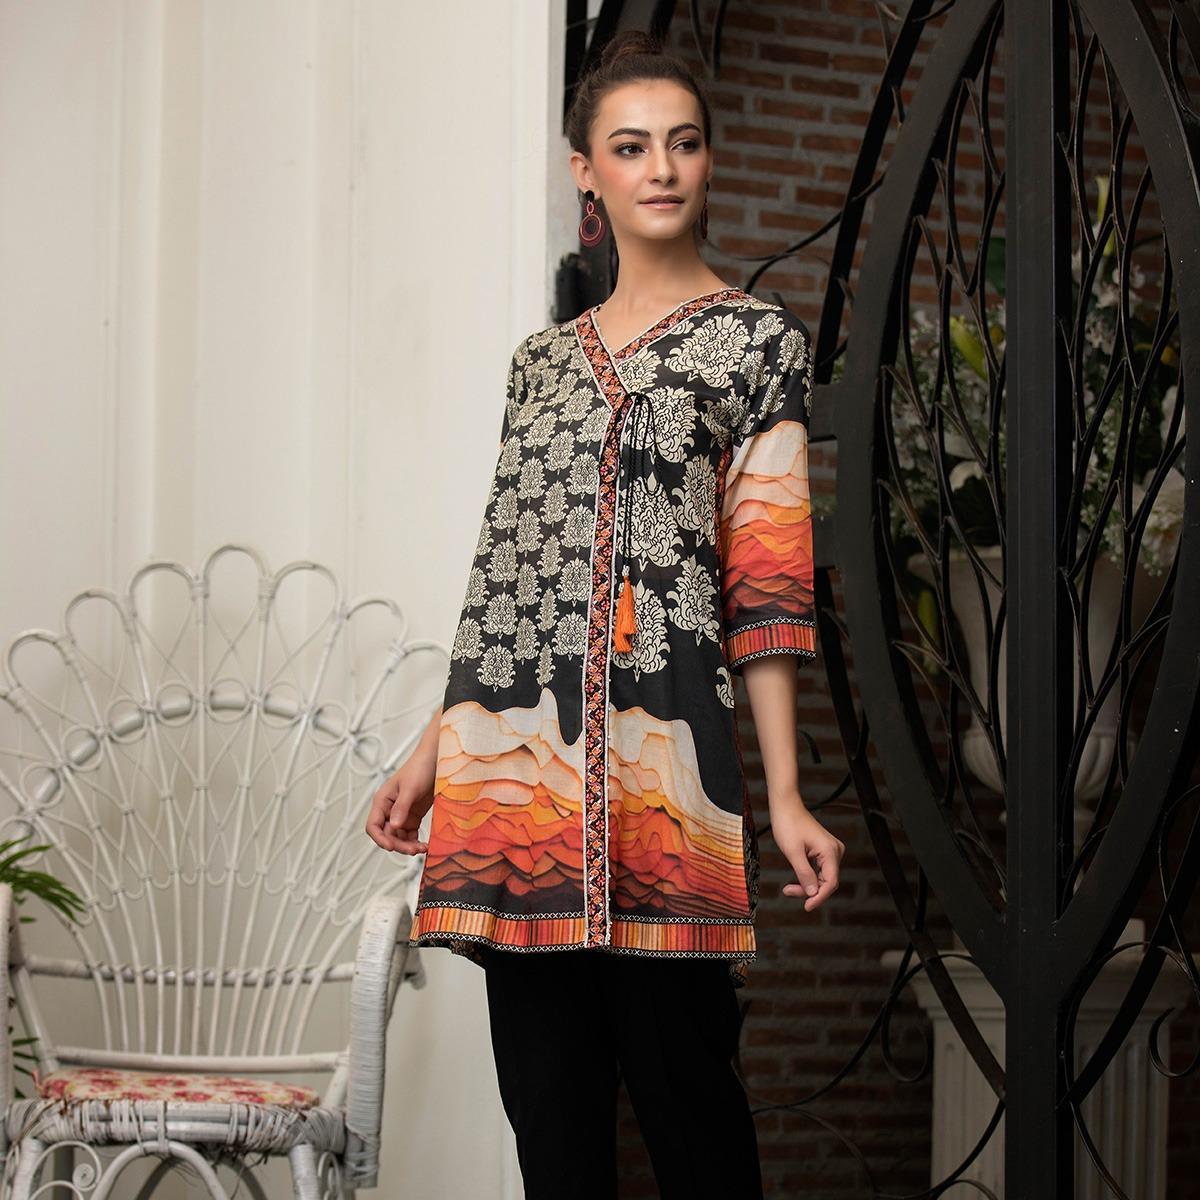 """Lsm Fabrics Komal Emb Kurti Coll 2019 Orange Unstitched - 1pc Kurti for Women"""